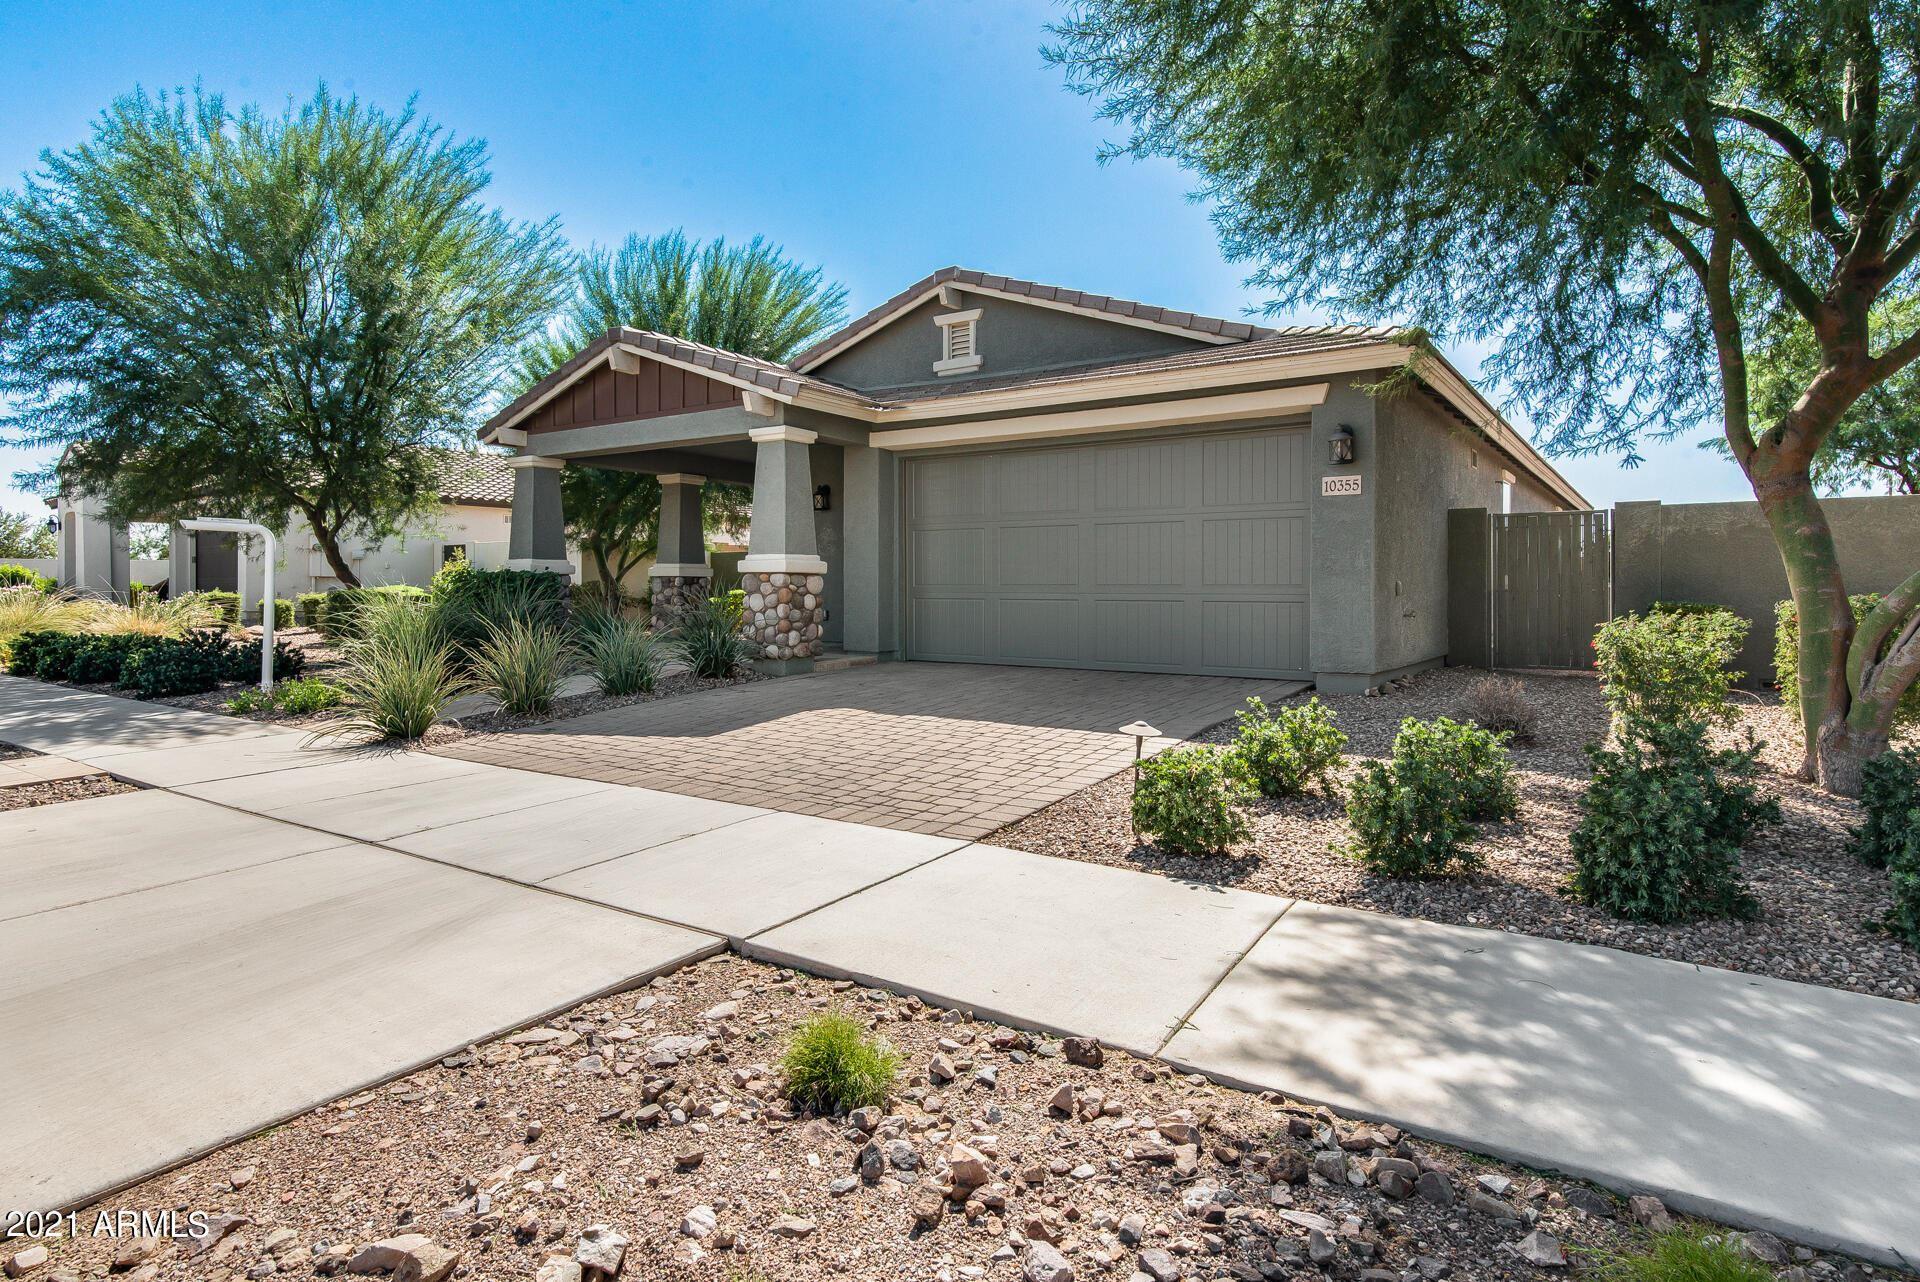 Photo of 10355 E TRIPOLI Avenue, Mesa, AZ 85212 (MLS # 6305005)